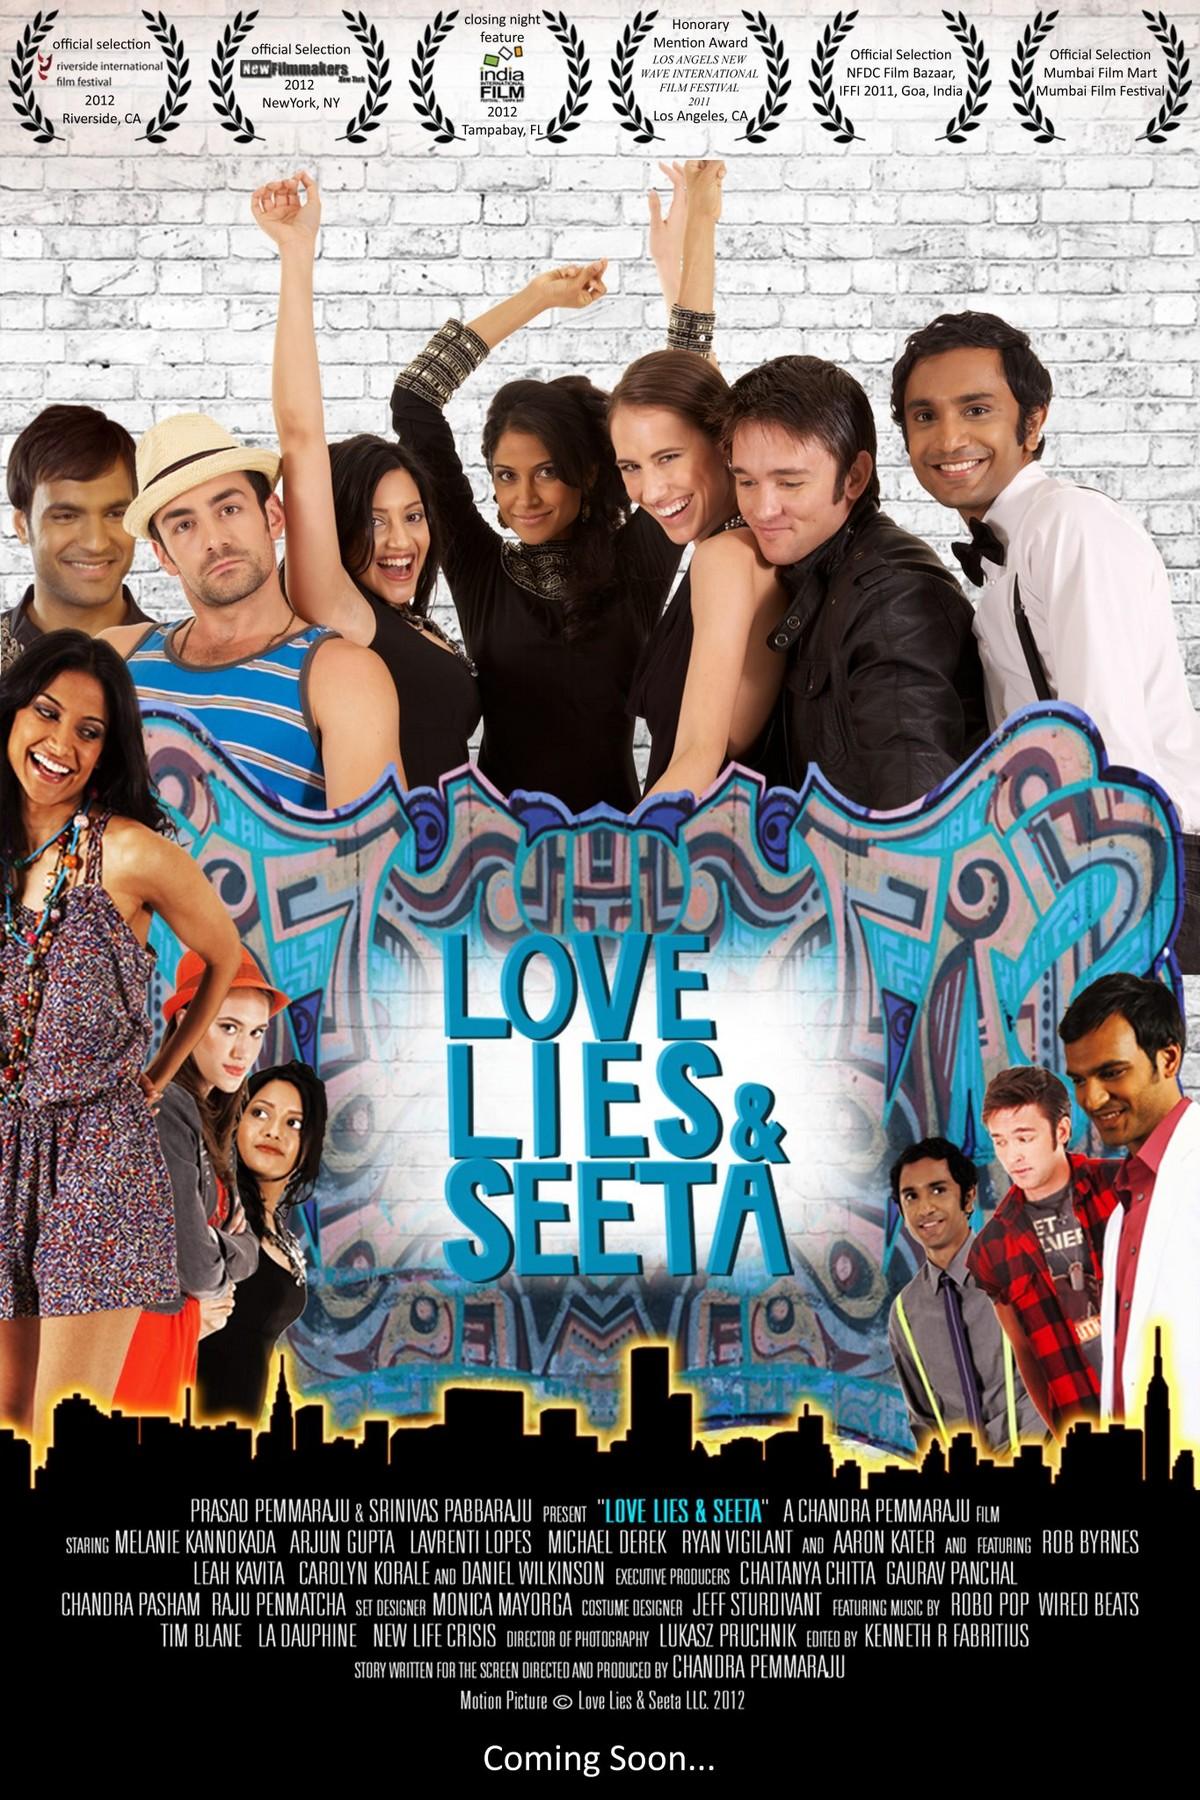 Love Lies and Seeta - Movie Poster #1 (Original)